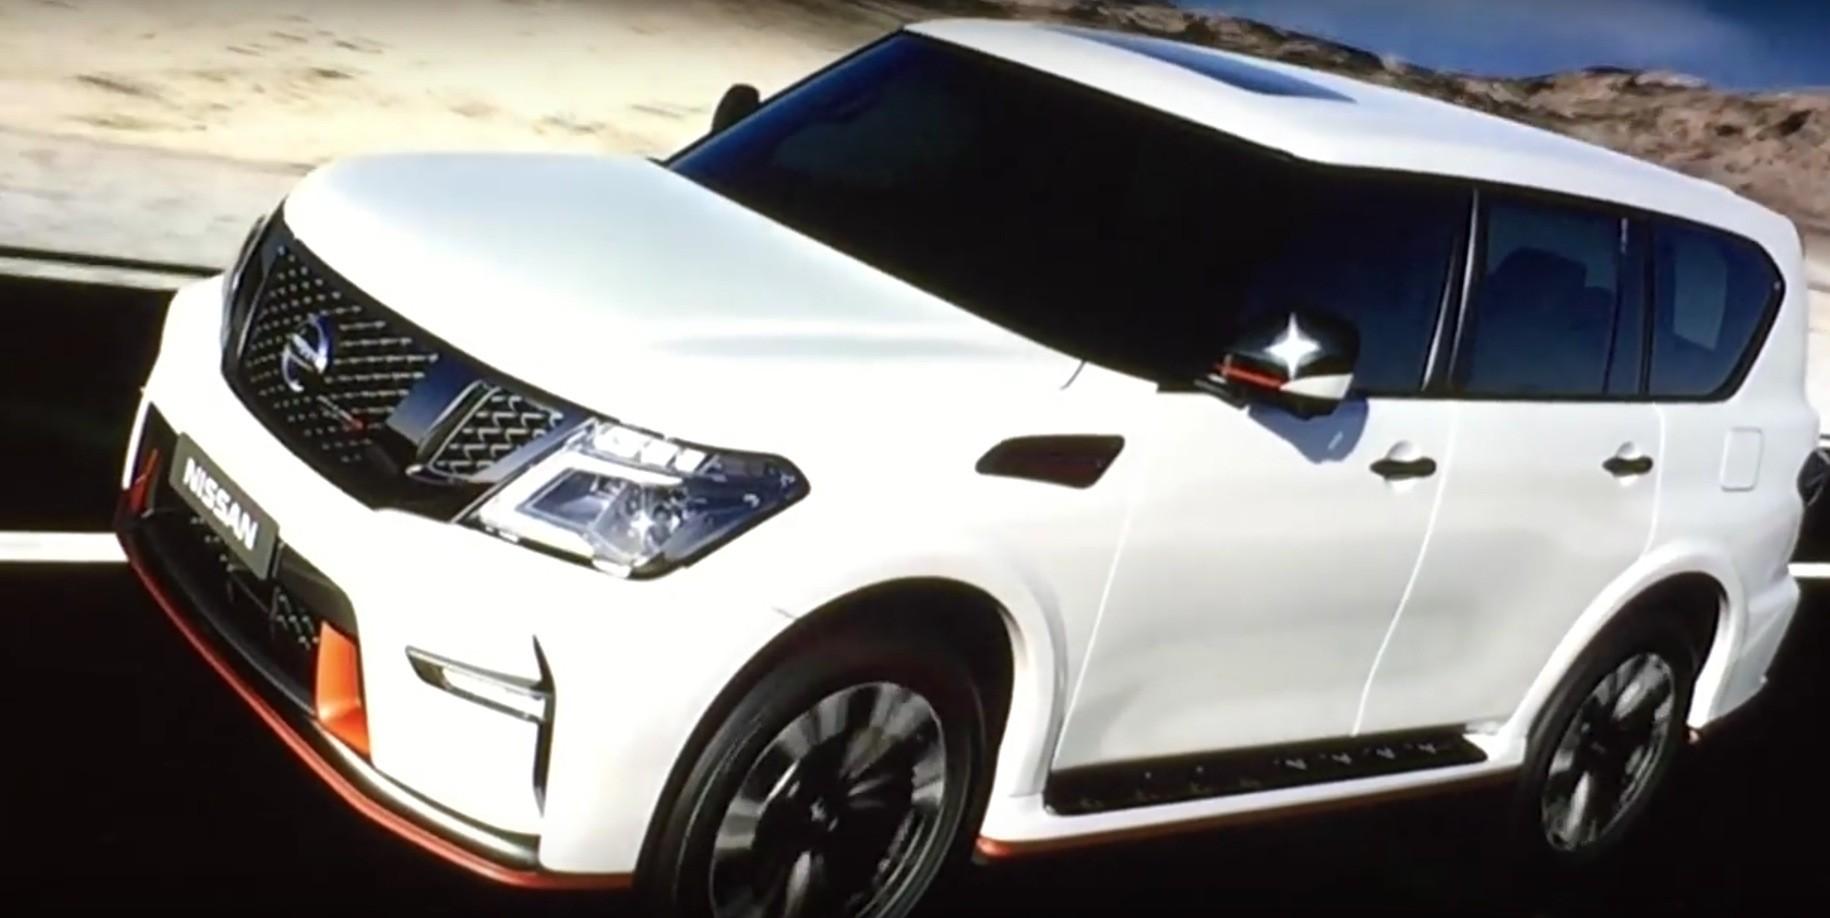 Nissan Patrol 2016 Nismo In UAE New Car Prices Specs